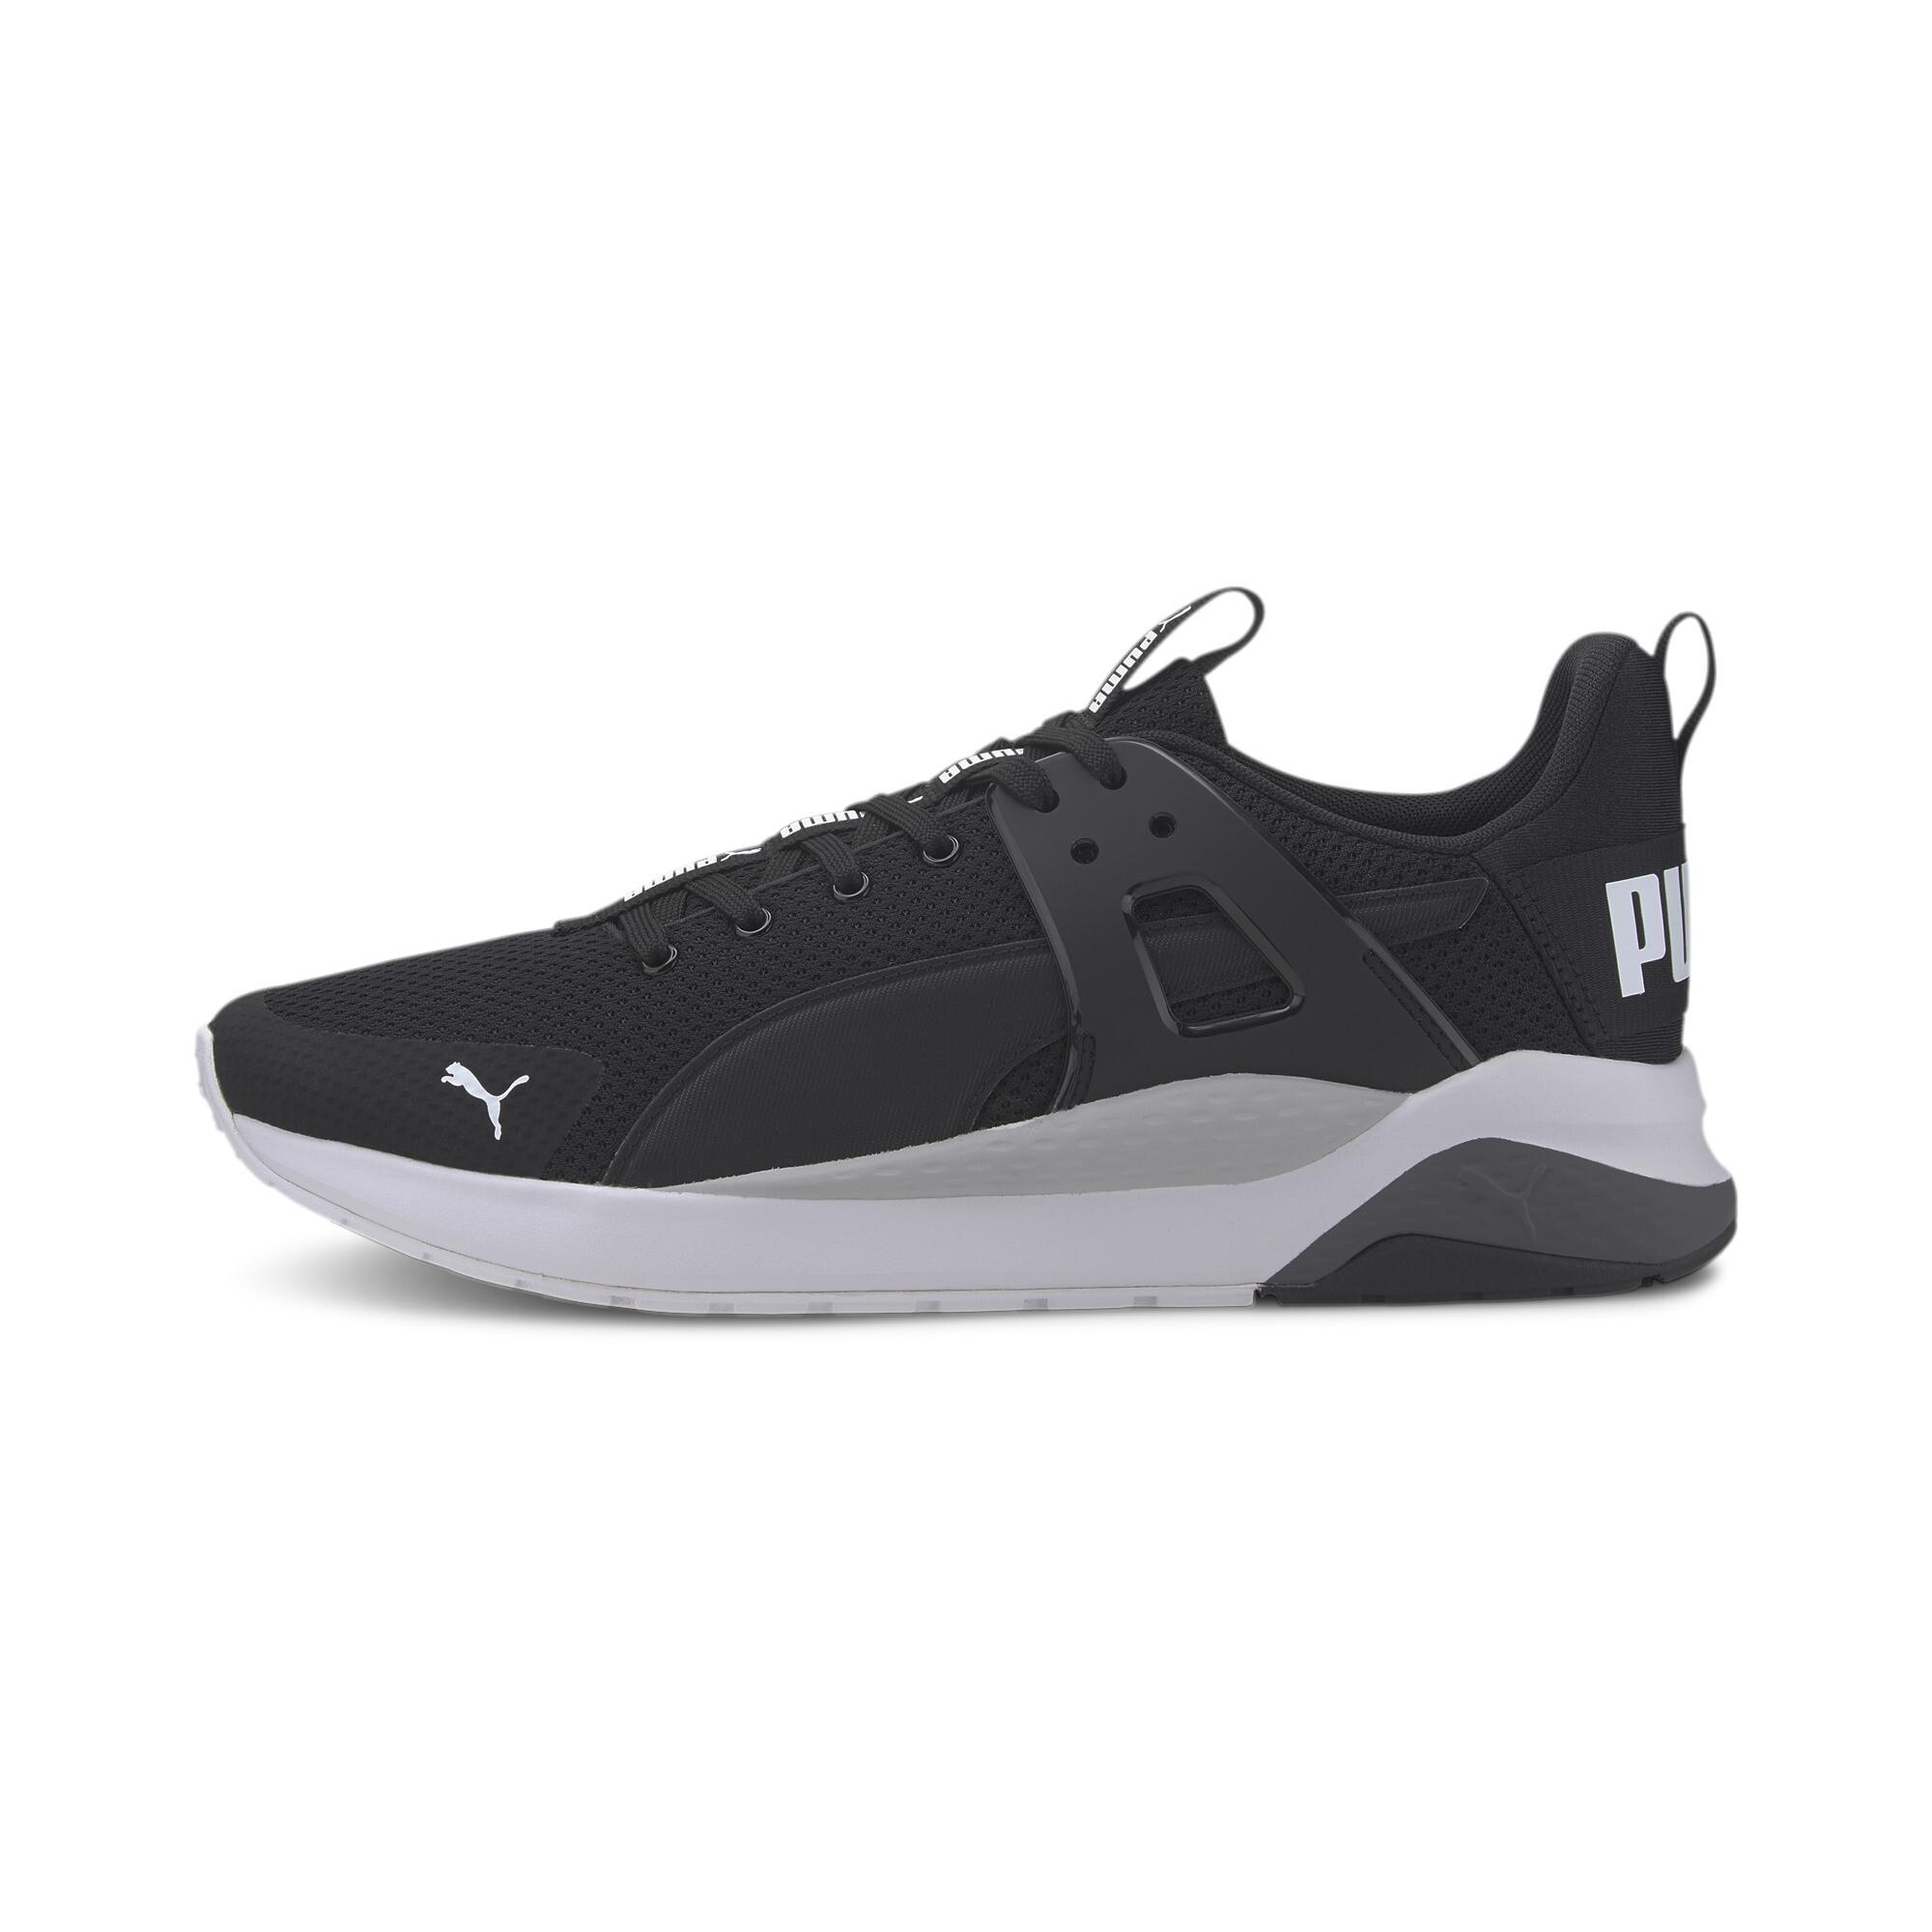 thumbnail 10 - PUMA-Men-039-s-Anzarun-Cage-Sneakers